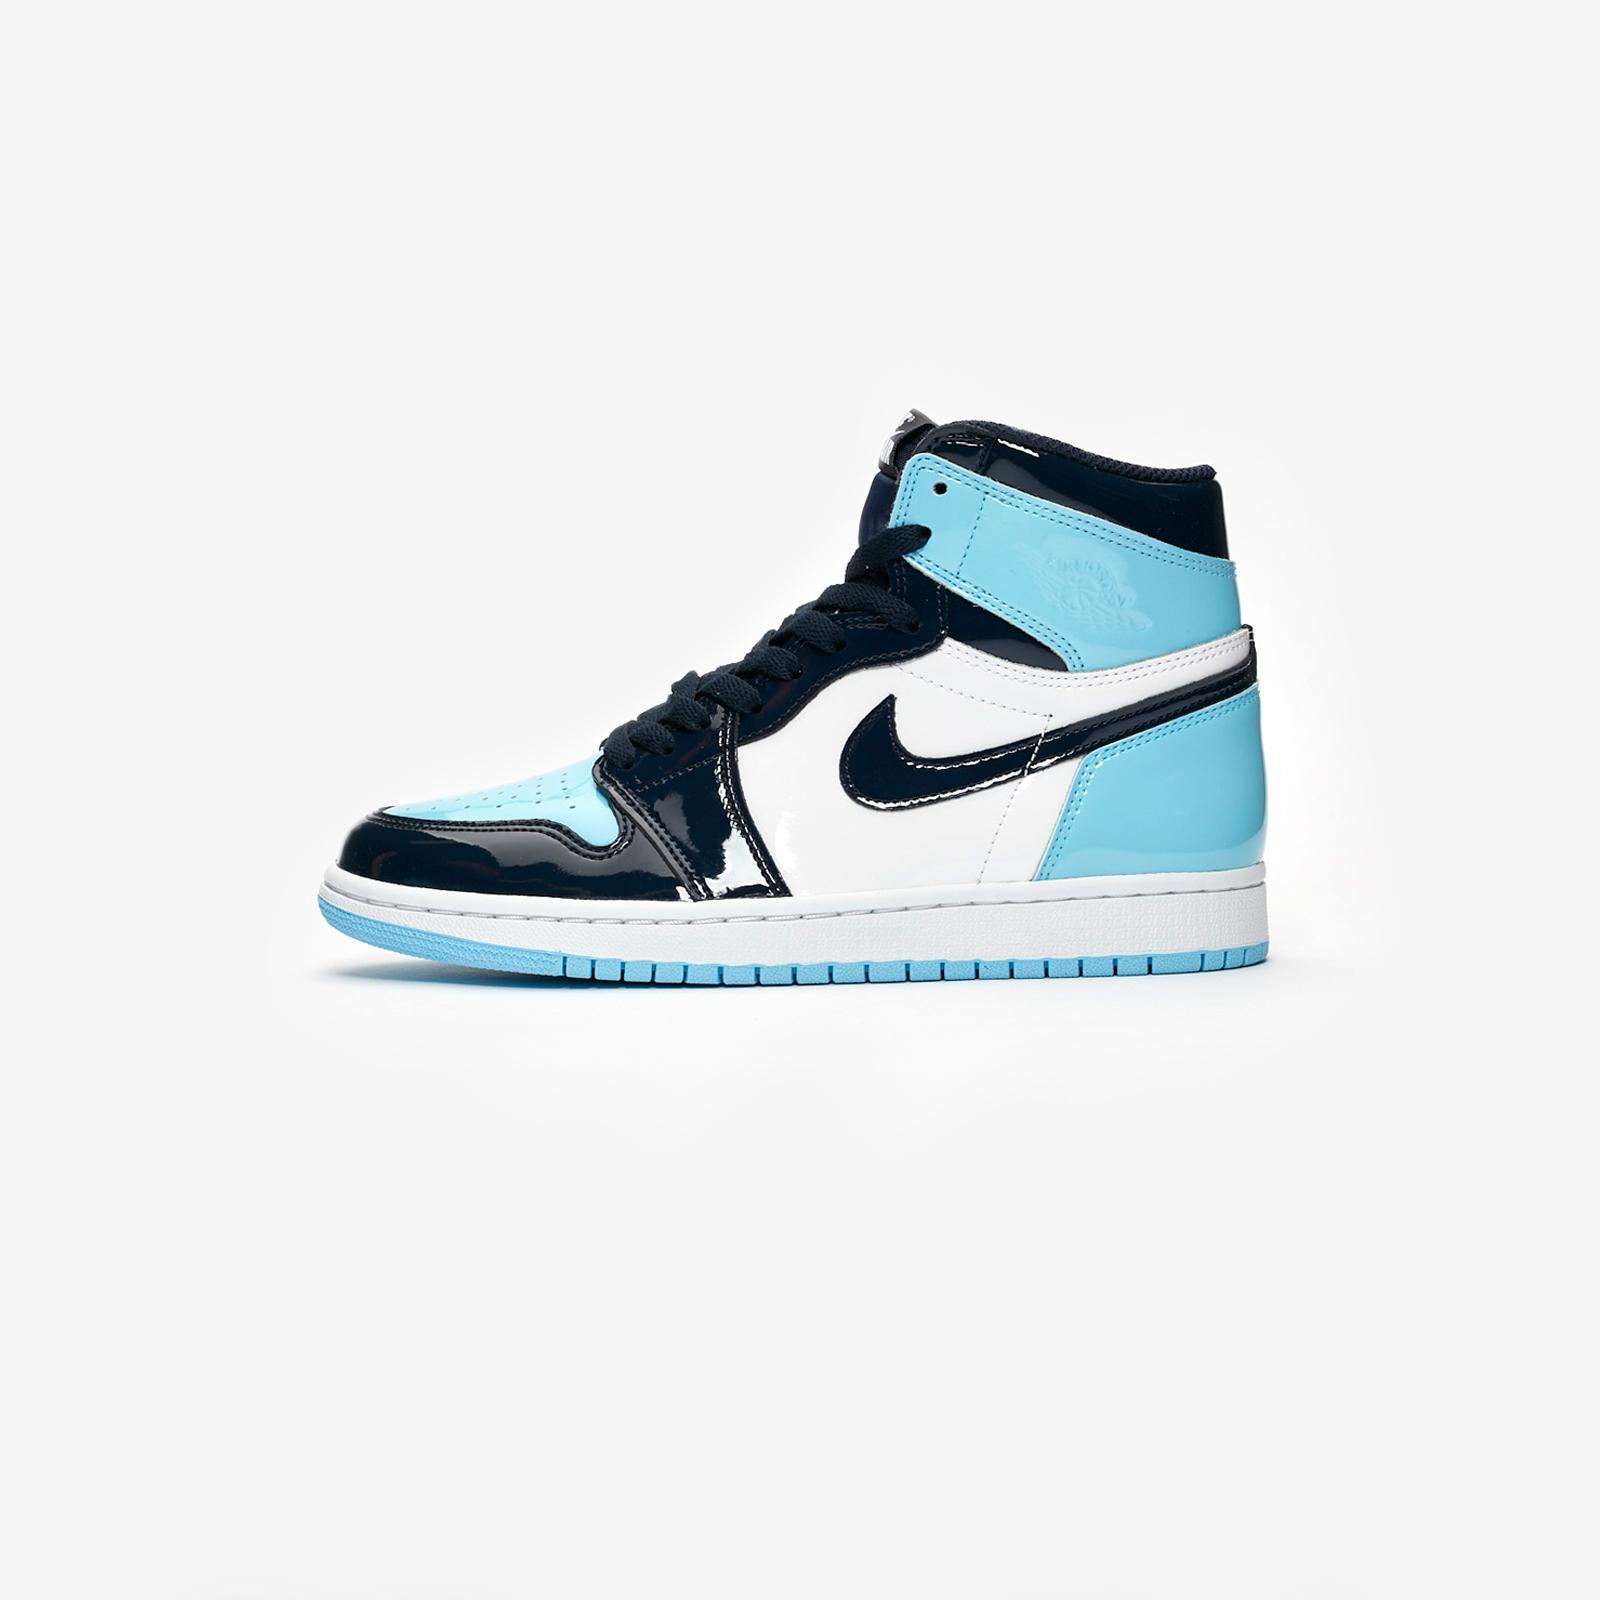 efb9bede607612 Jordan Brand Wmns Air Jordan 1 High OG - Cd0461-401 - Sneakersnstuff ...